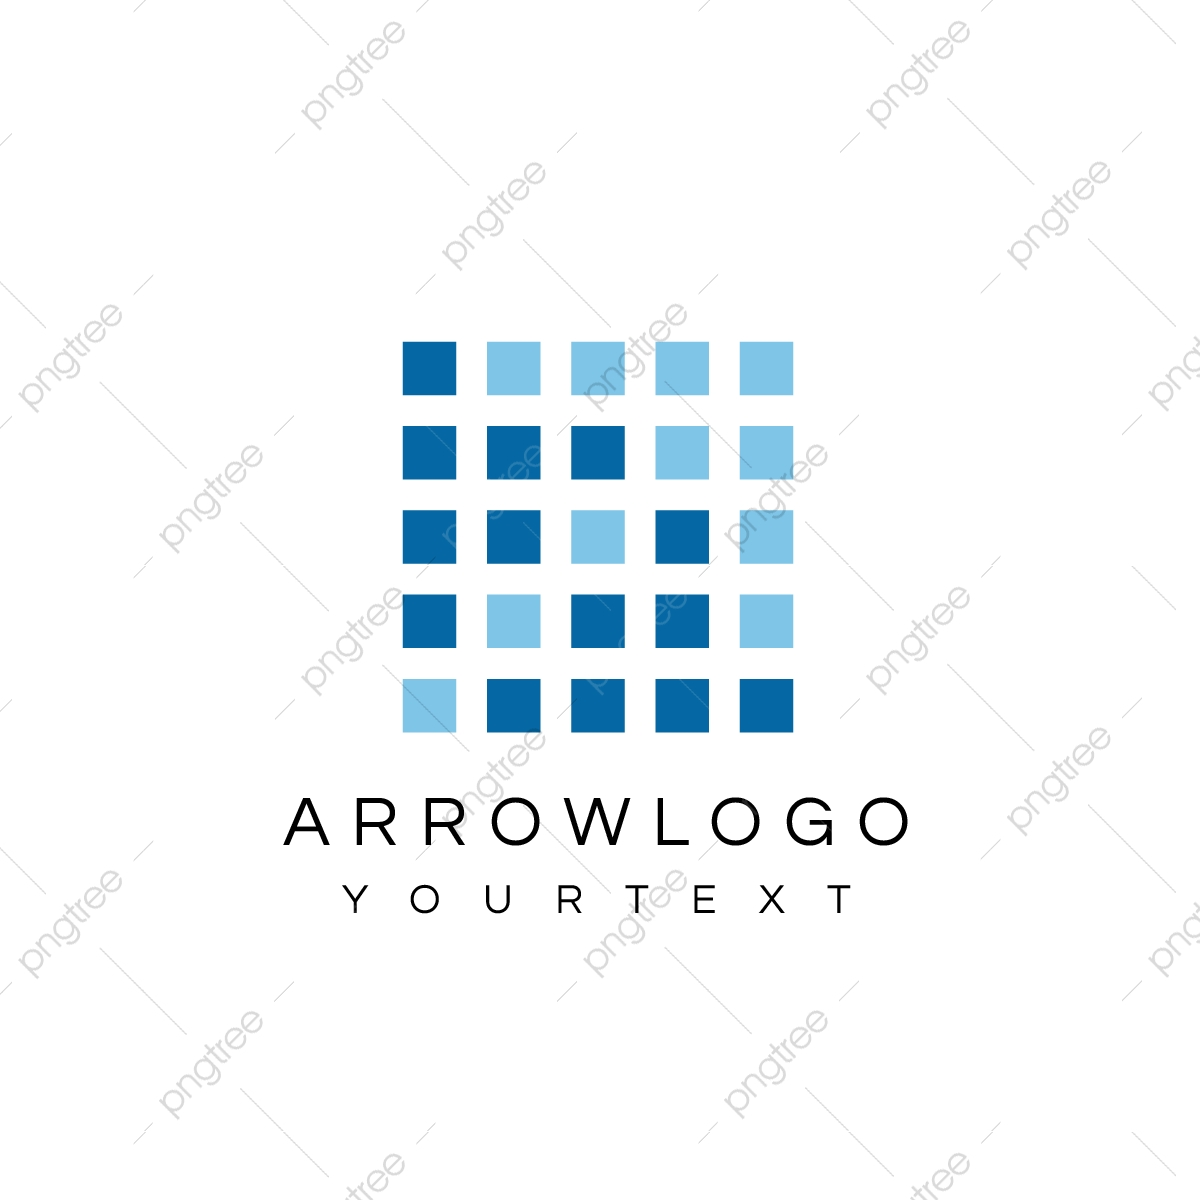 Arrow Logo Png المتجهات Psd قصاصة فنية تحميل مجاني Pngtree